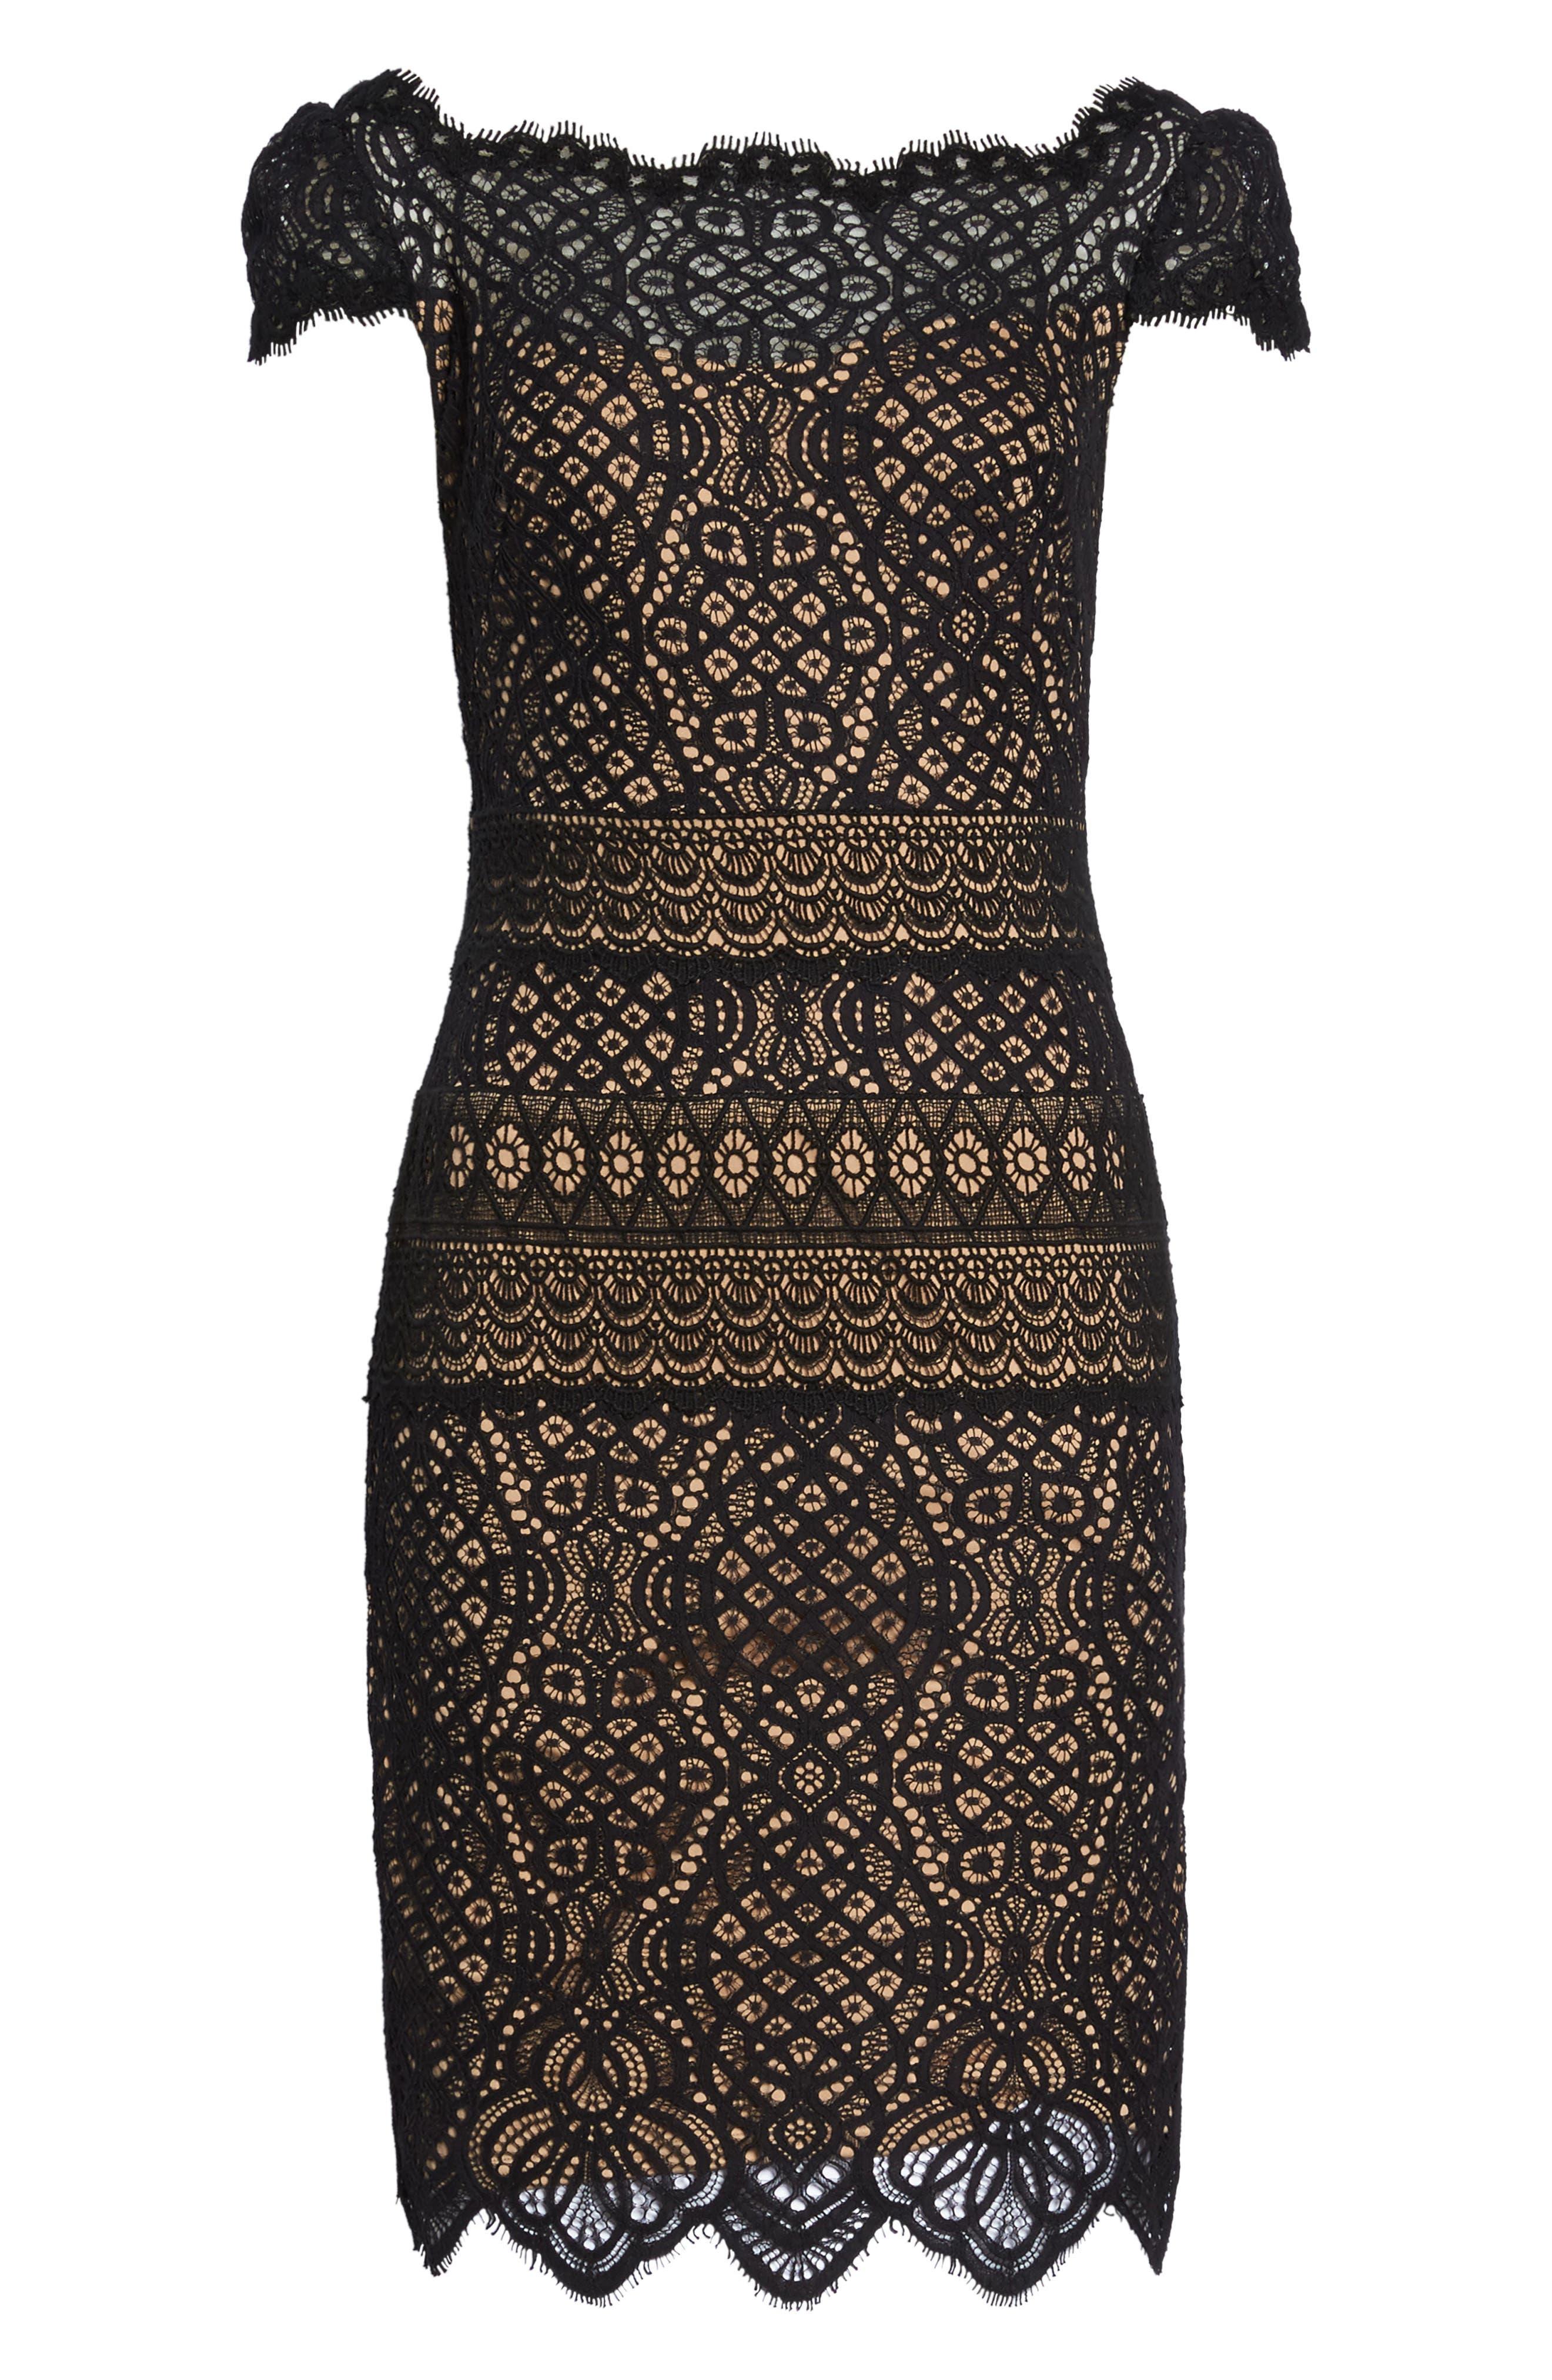 Lace Cap Sleeve Dress,                             Alternate thumbnail 6, color,                             Black / Nude